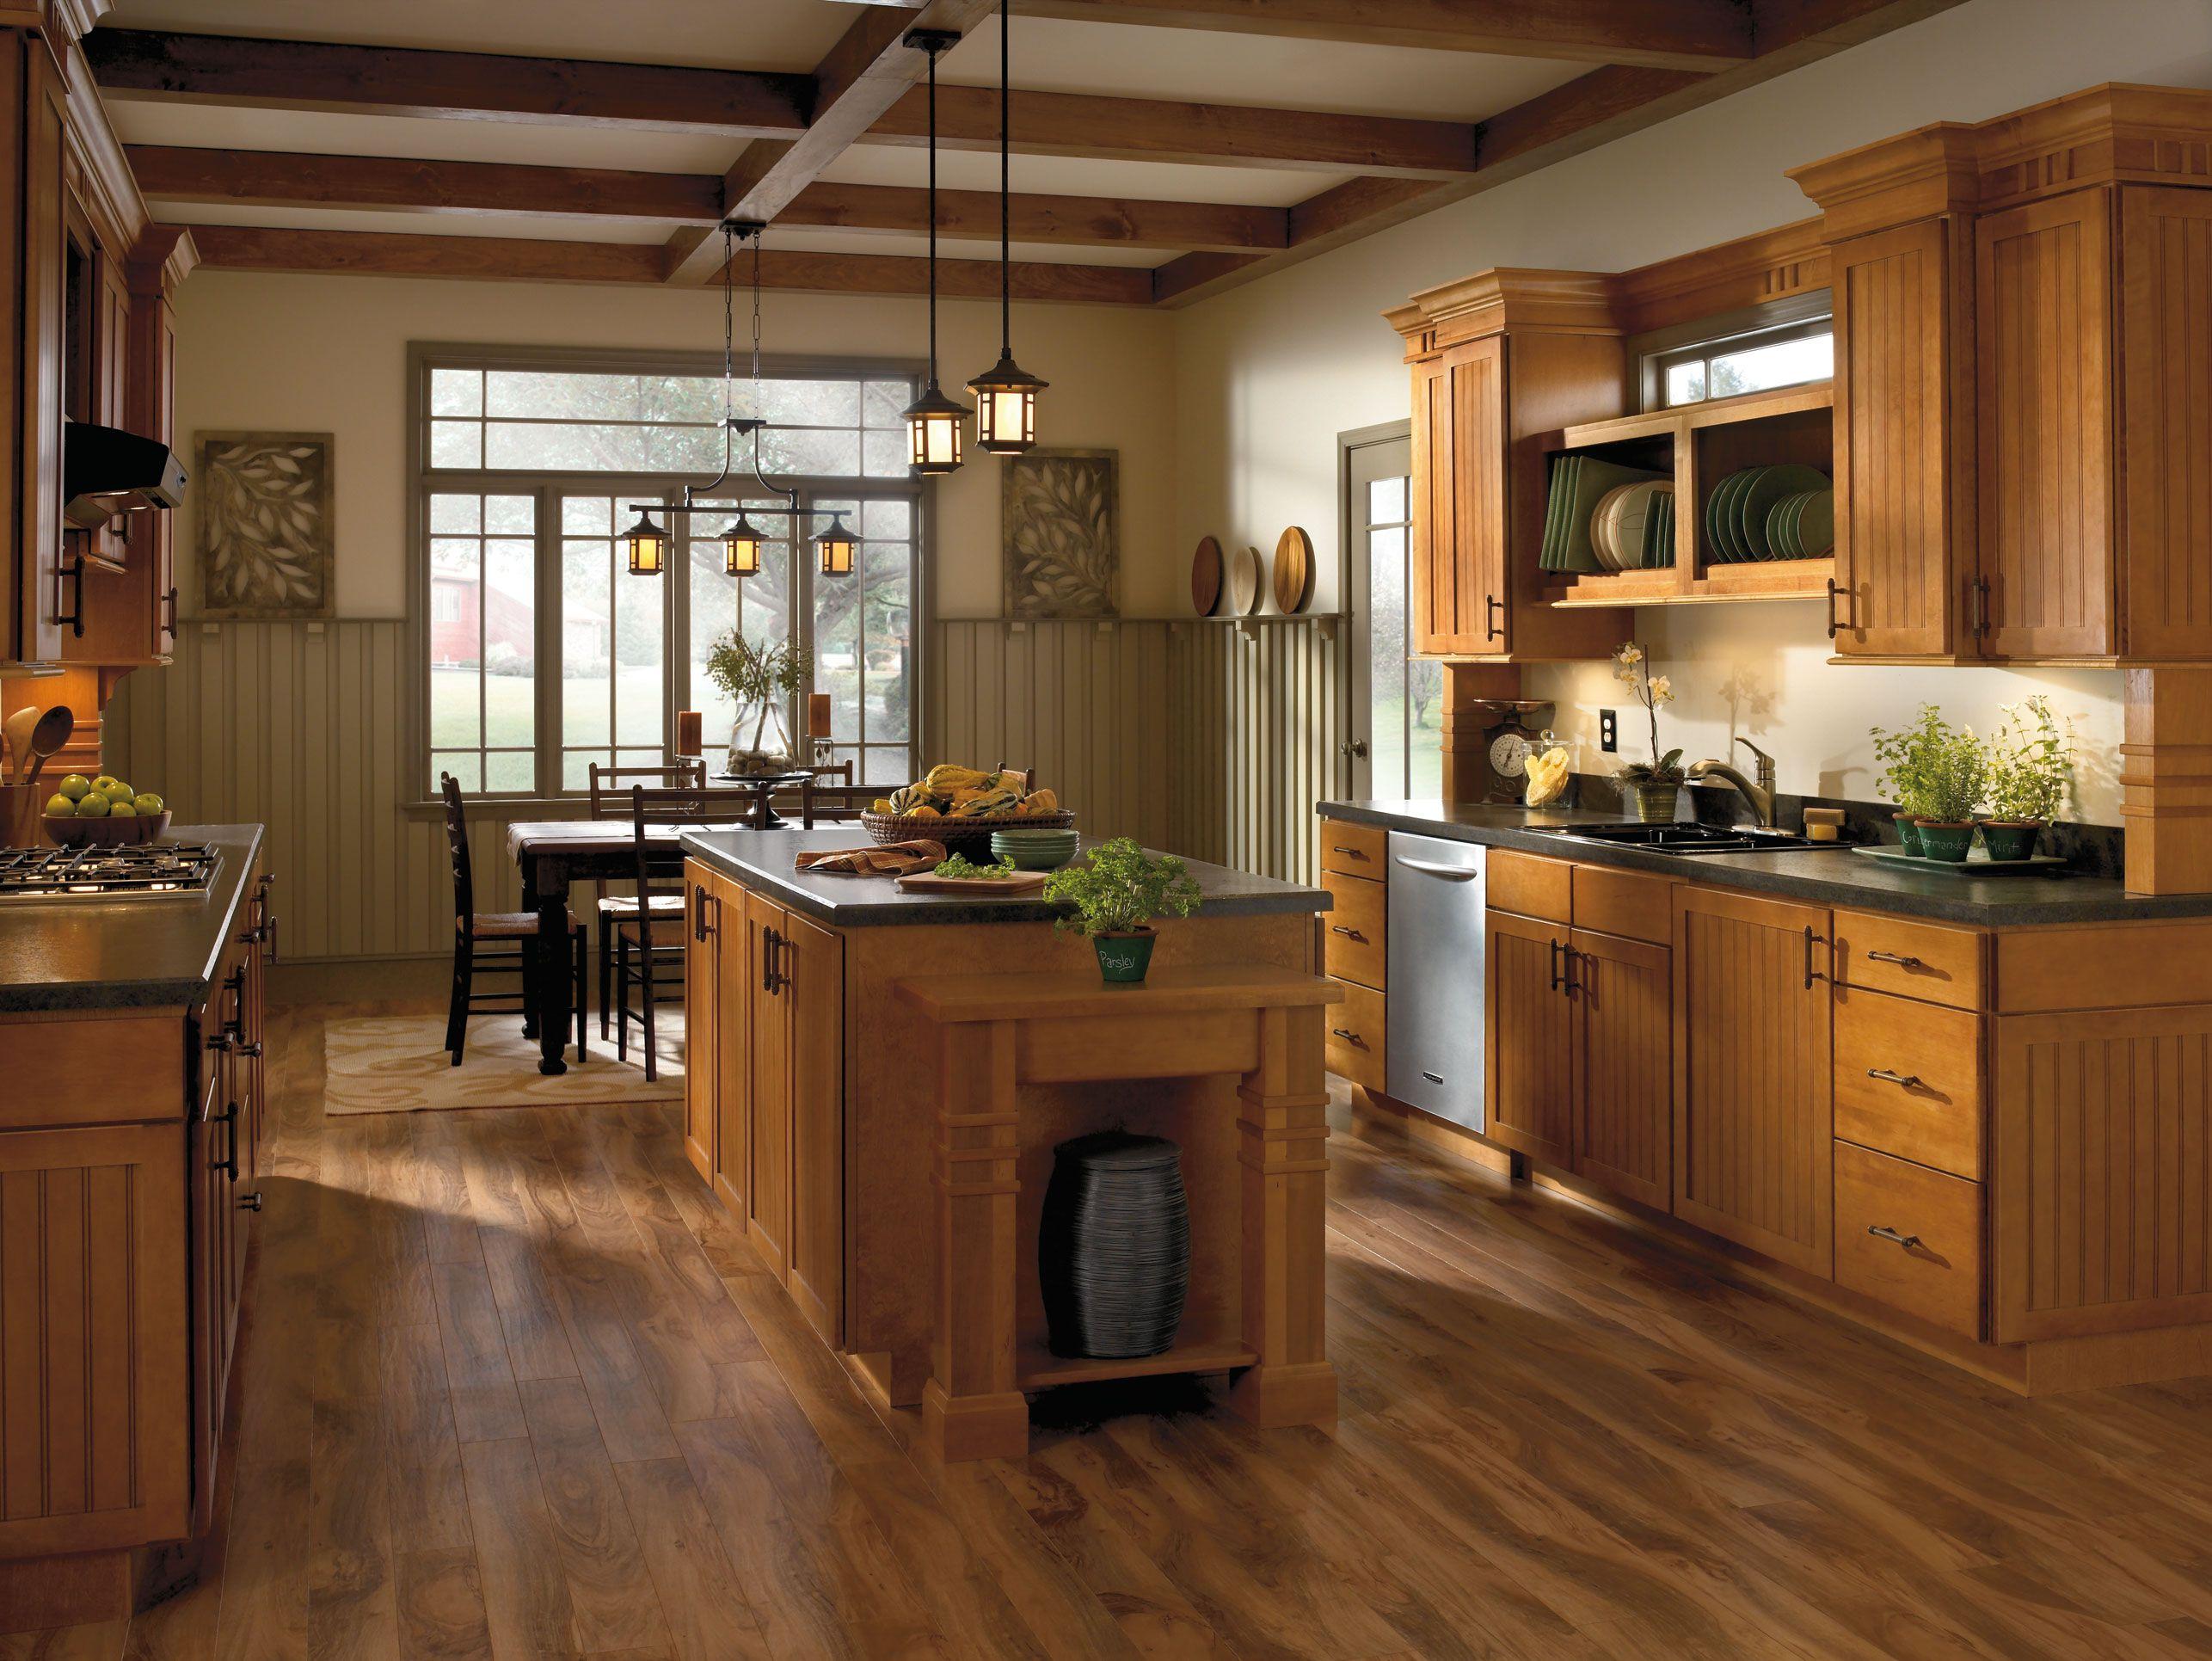 102 best aristokraft cabinetry images on pinterest | kitchen ideas